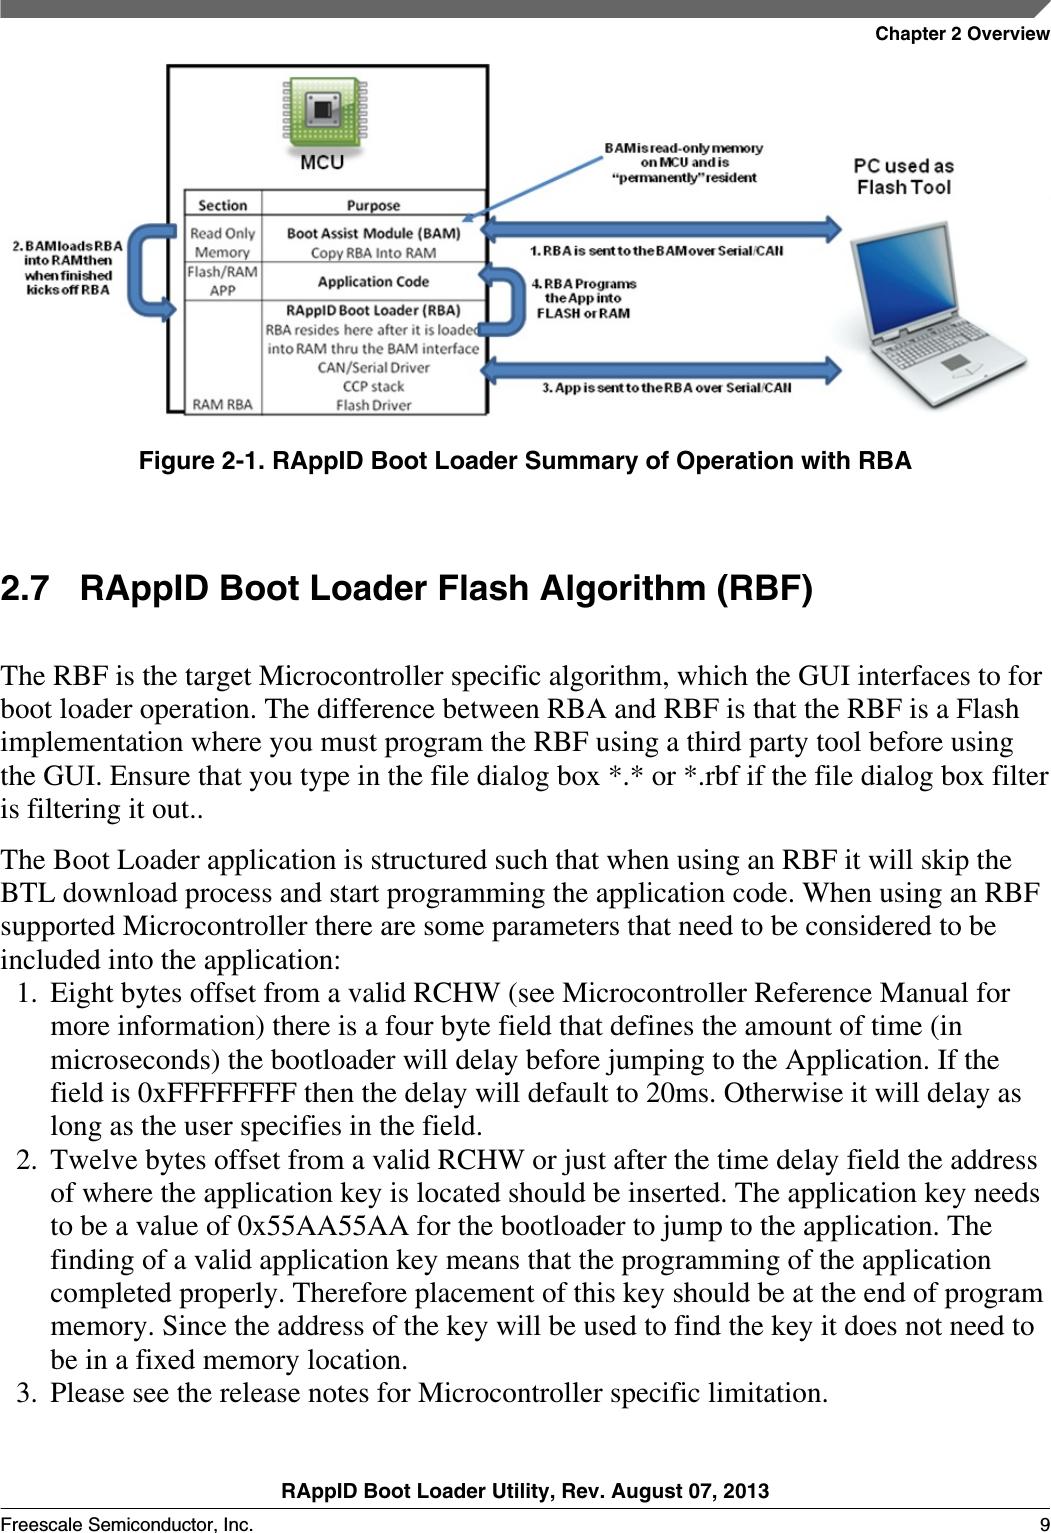 RAppID Boot Loader Utility BL User Manual